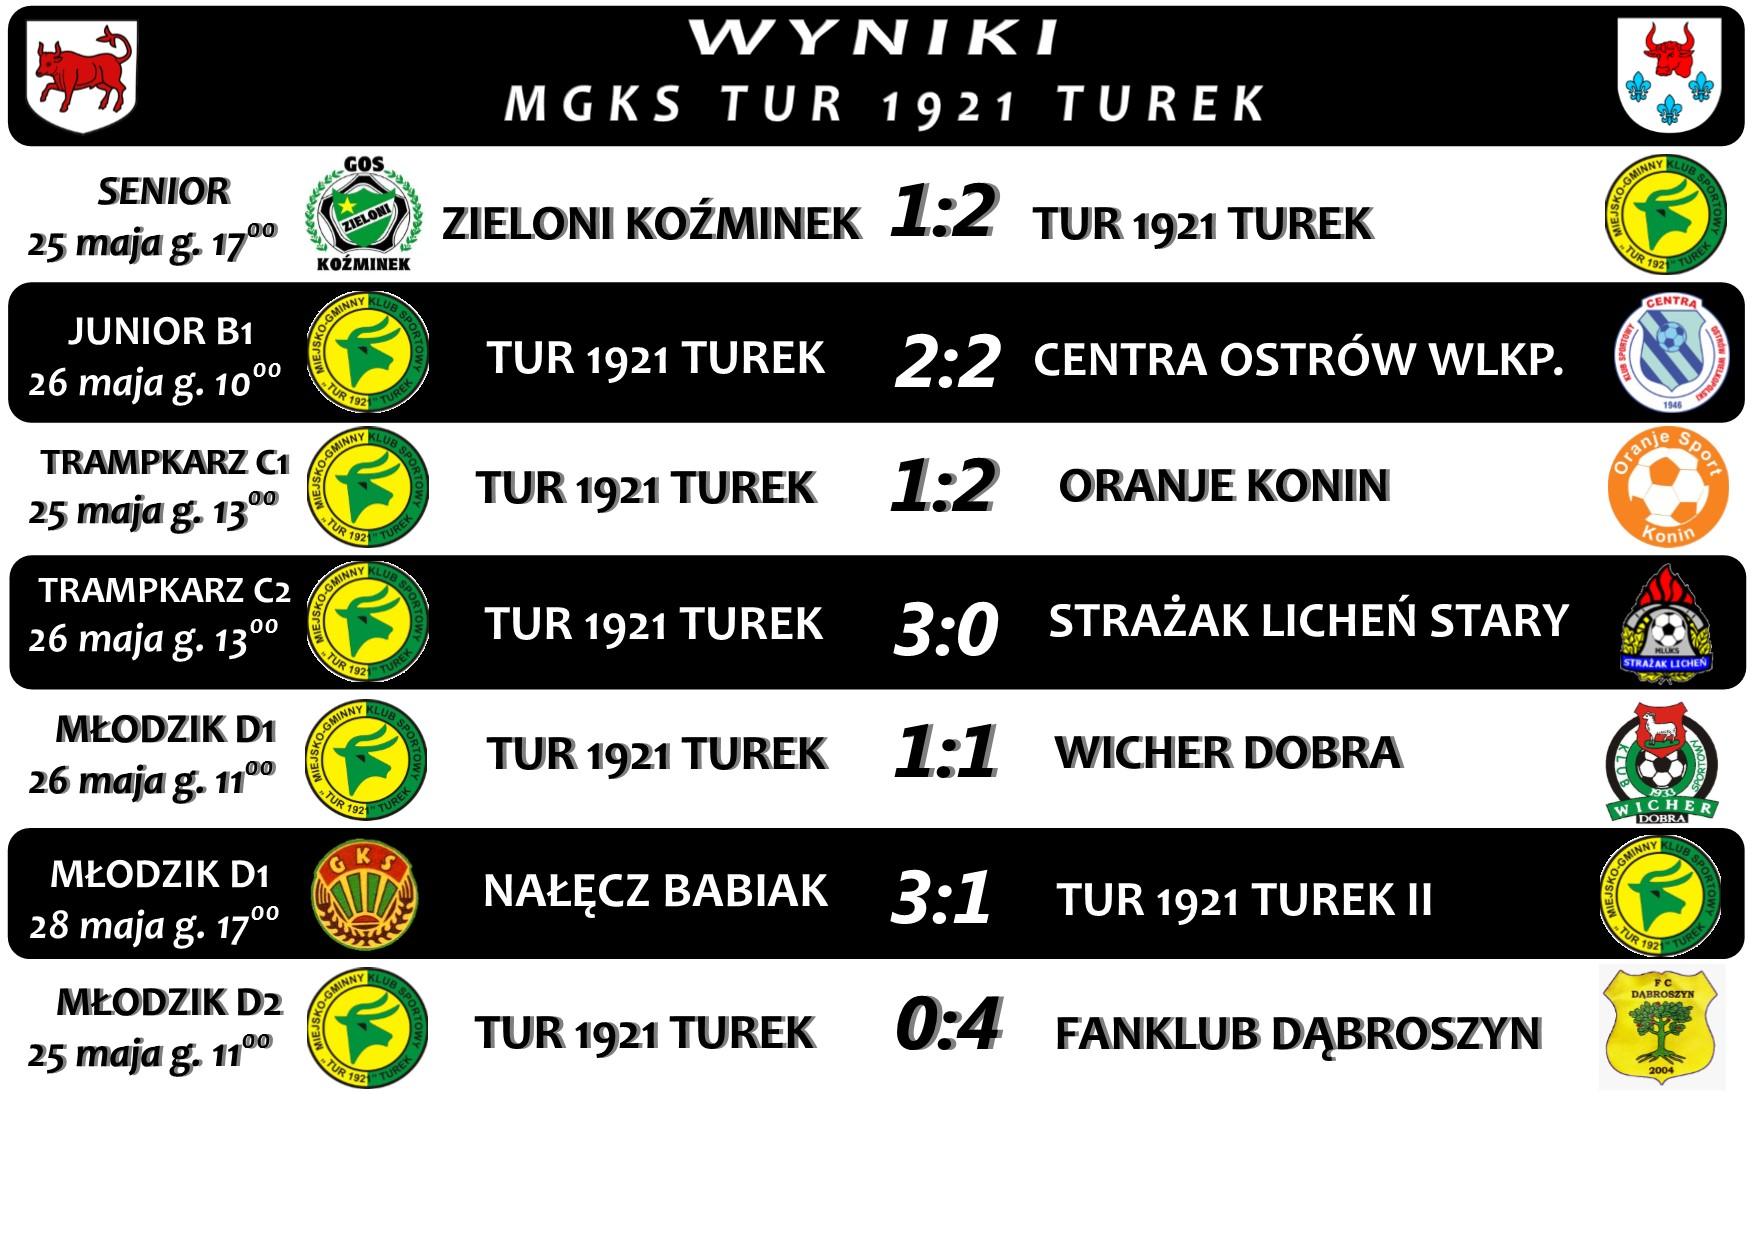 Wyniki drużyn Tur 1921 Turek